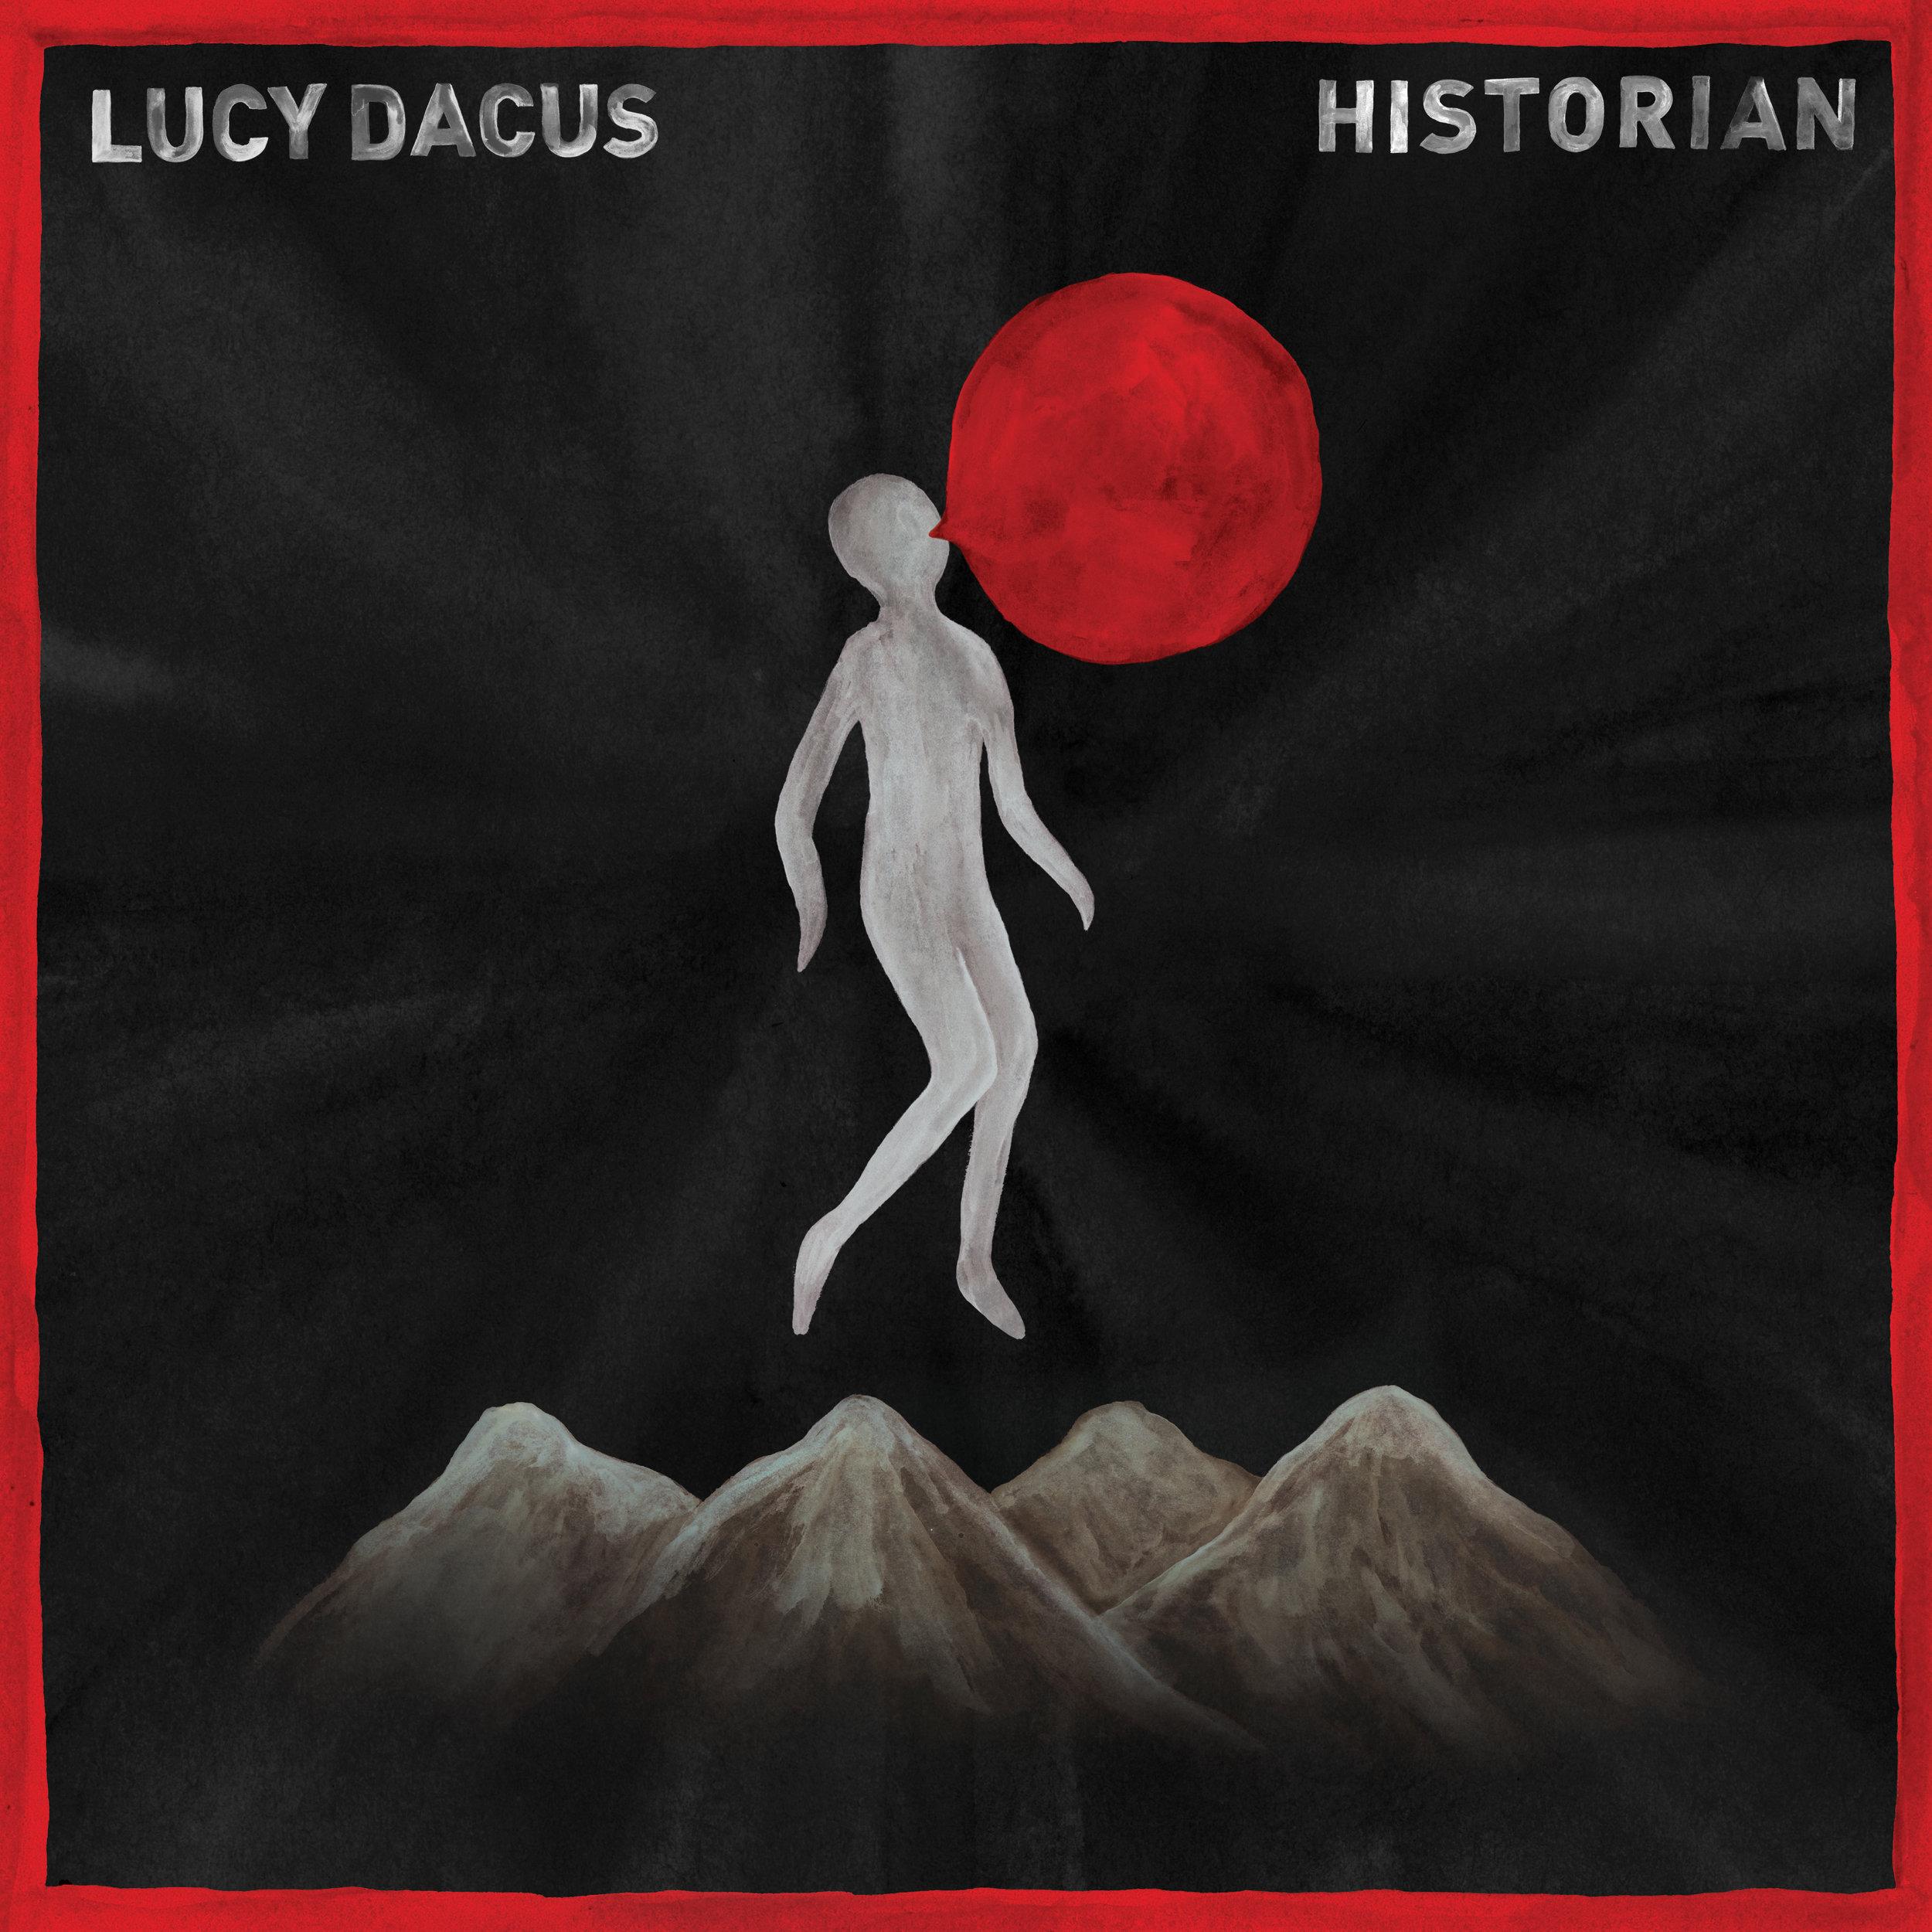 LucyDacus_Historian art.jpg